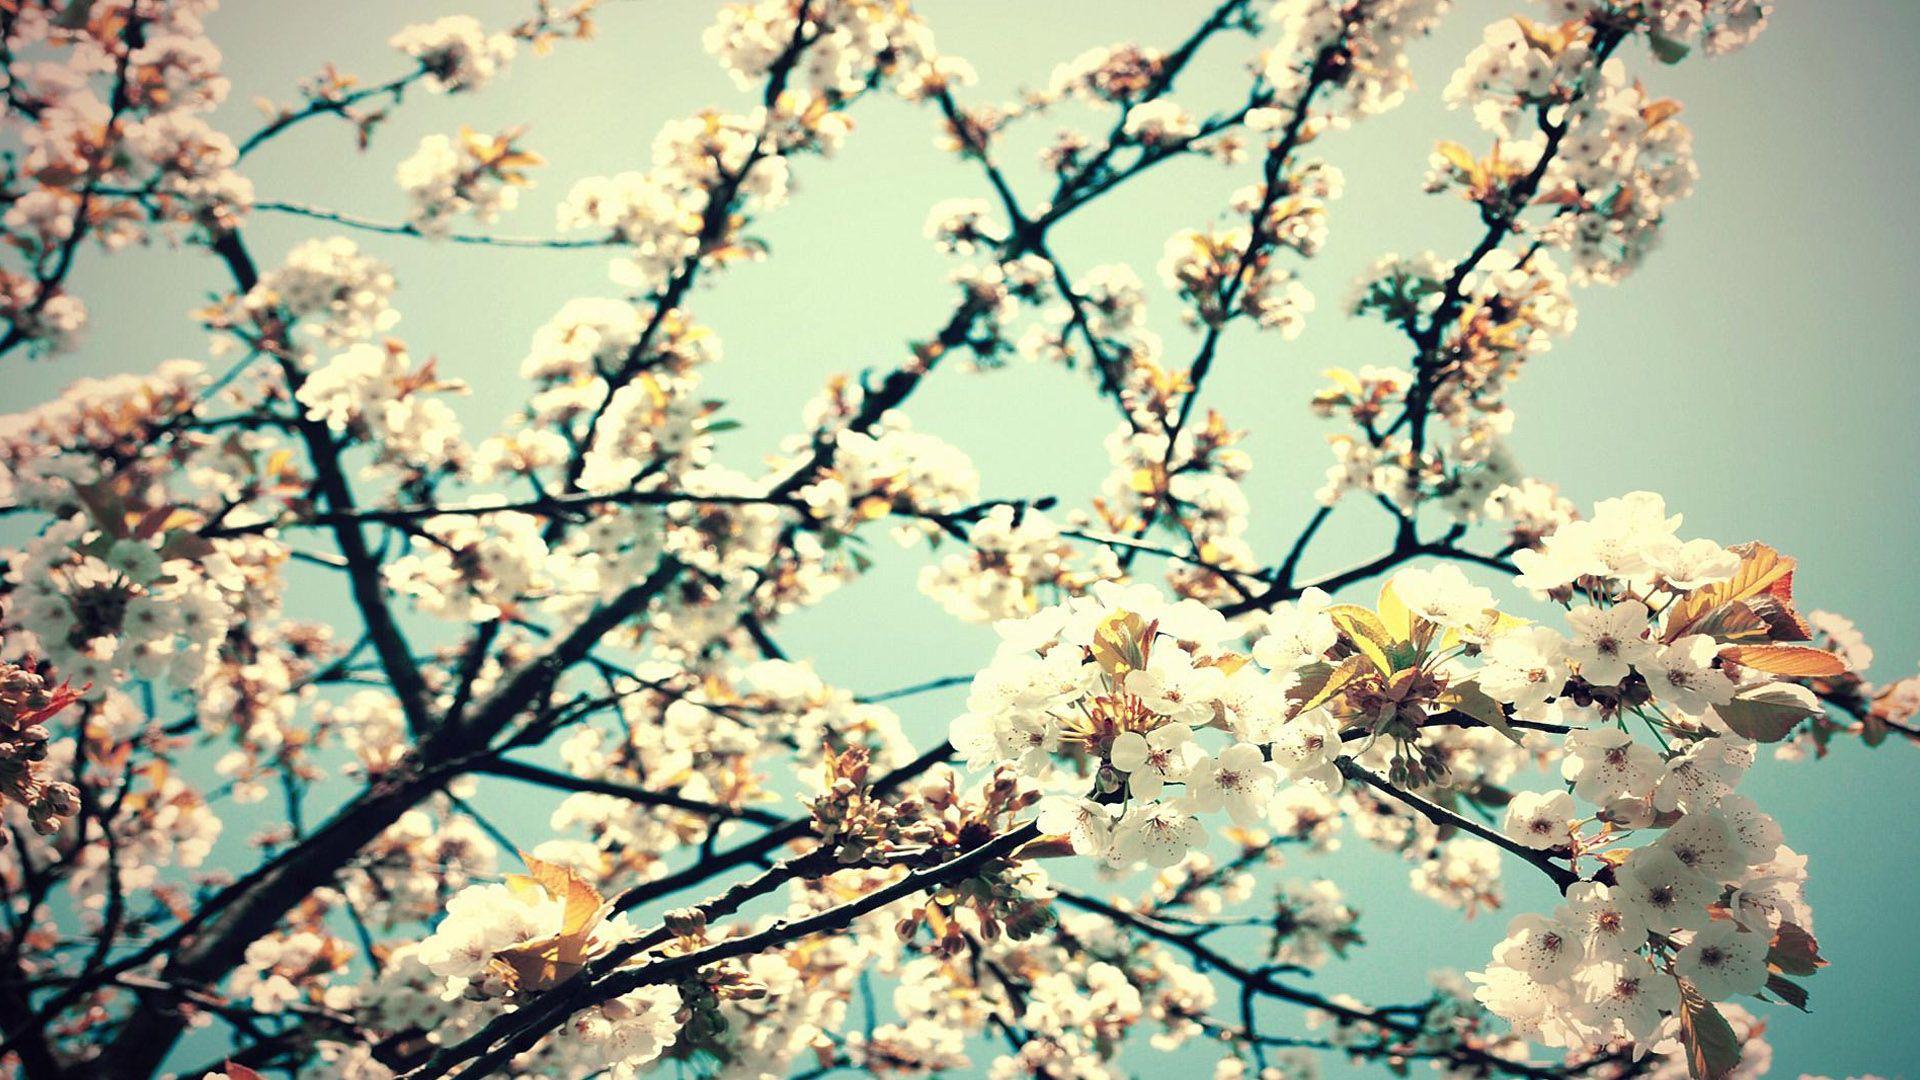 Imagenes De Fondo Flores Para Pantalla Hd 2: Wallpapers De Flores Tumblr Para Fondo De Pantalla En Hd